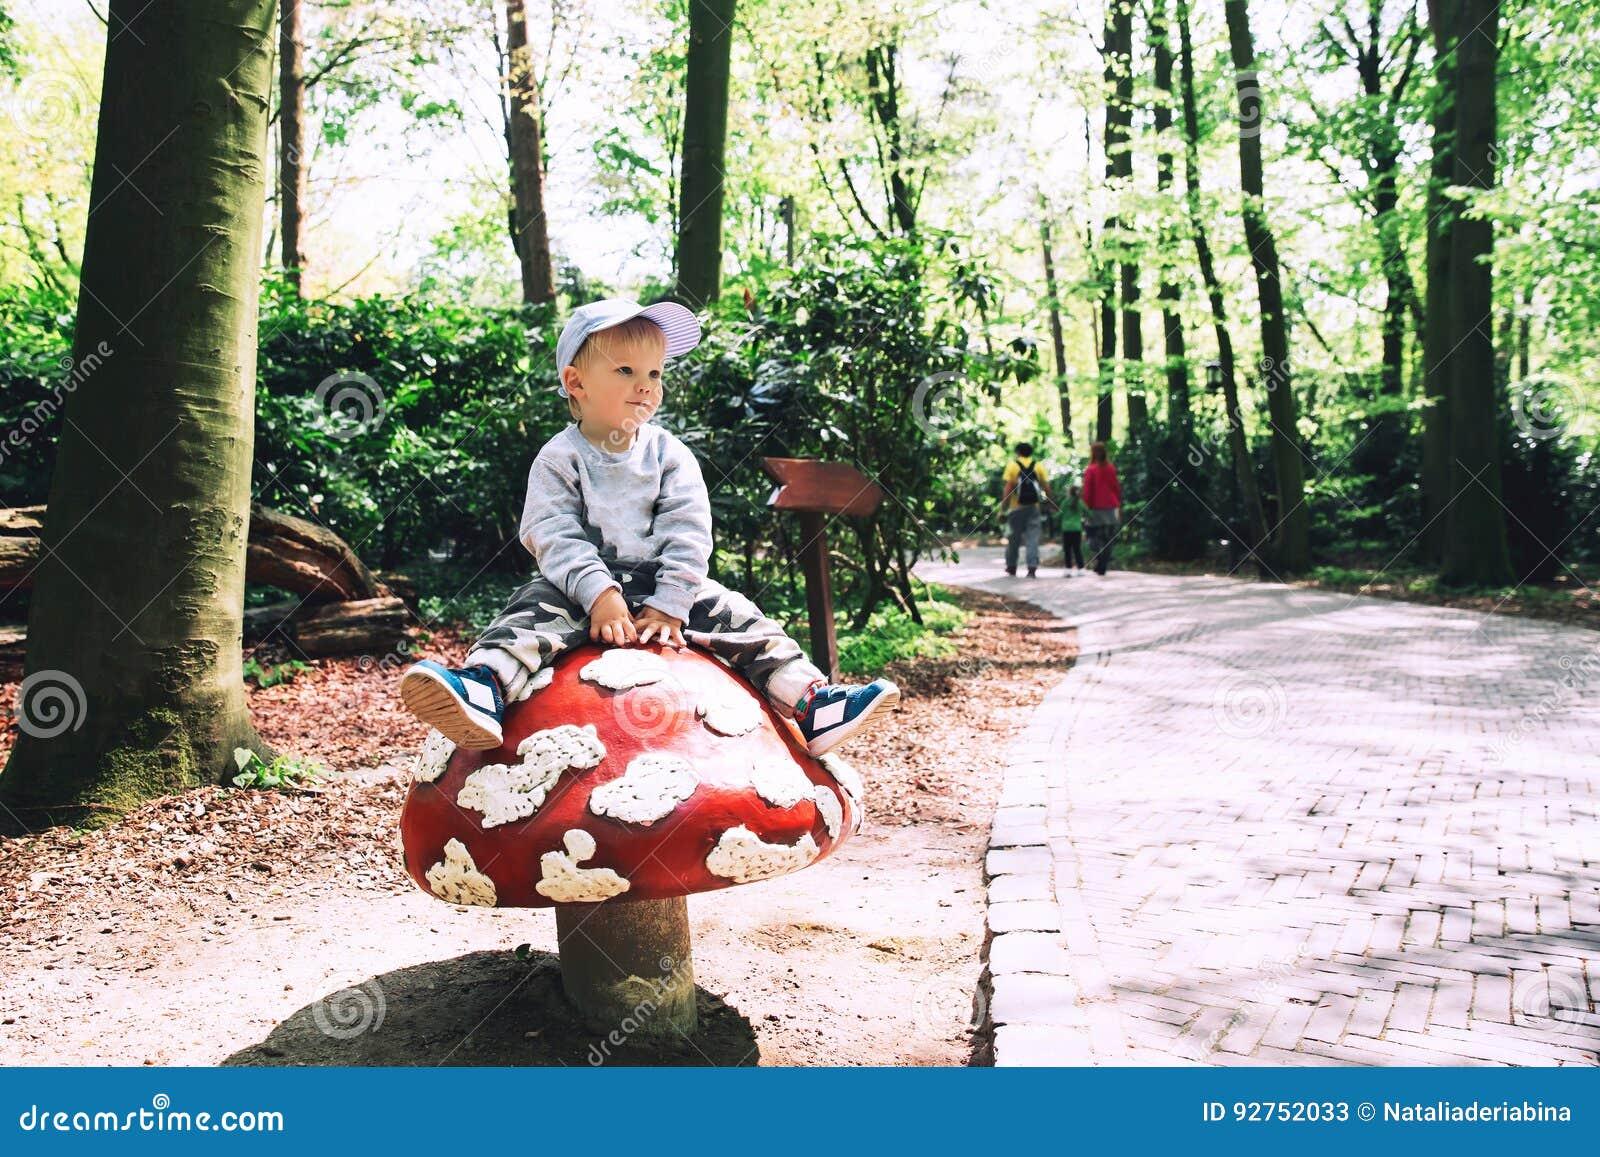 Familie hat Spaß am Vergnügungspark Efteling, die Niederlande